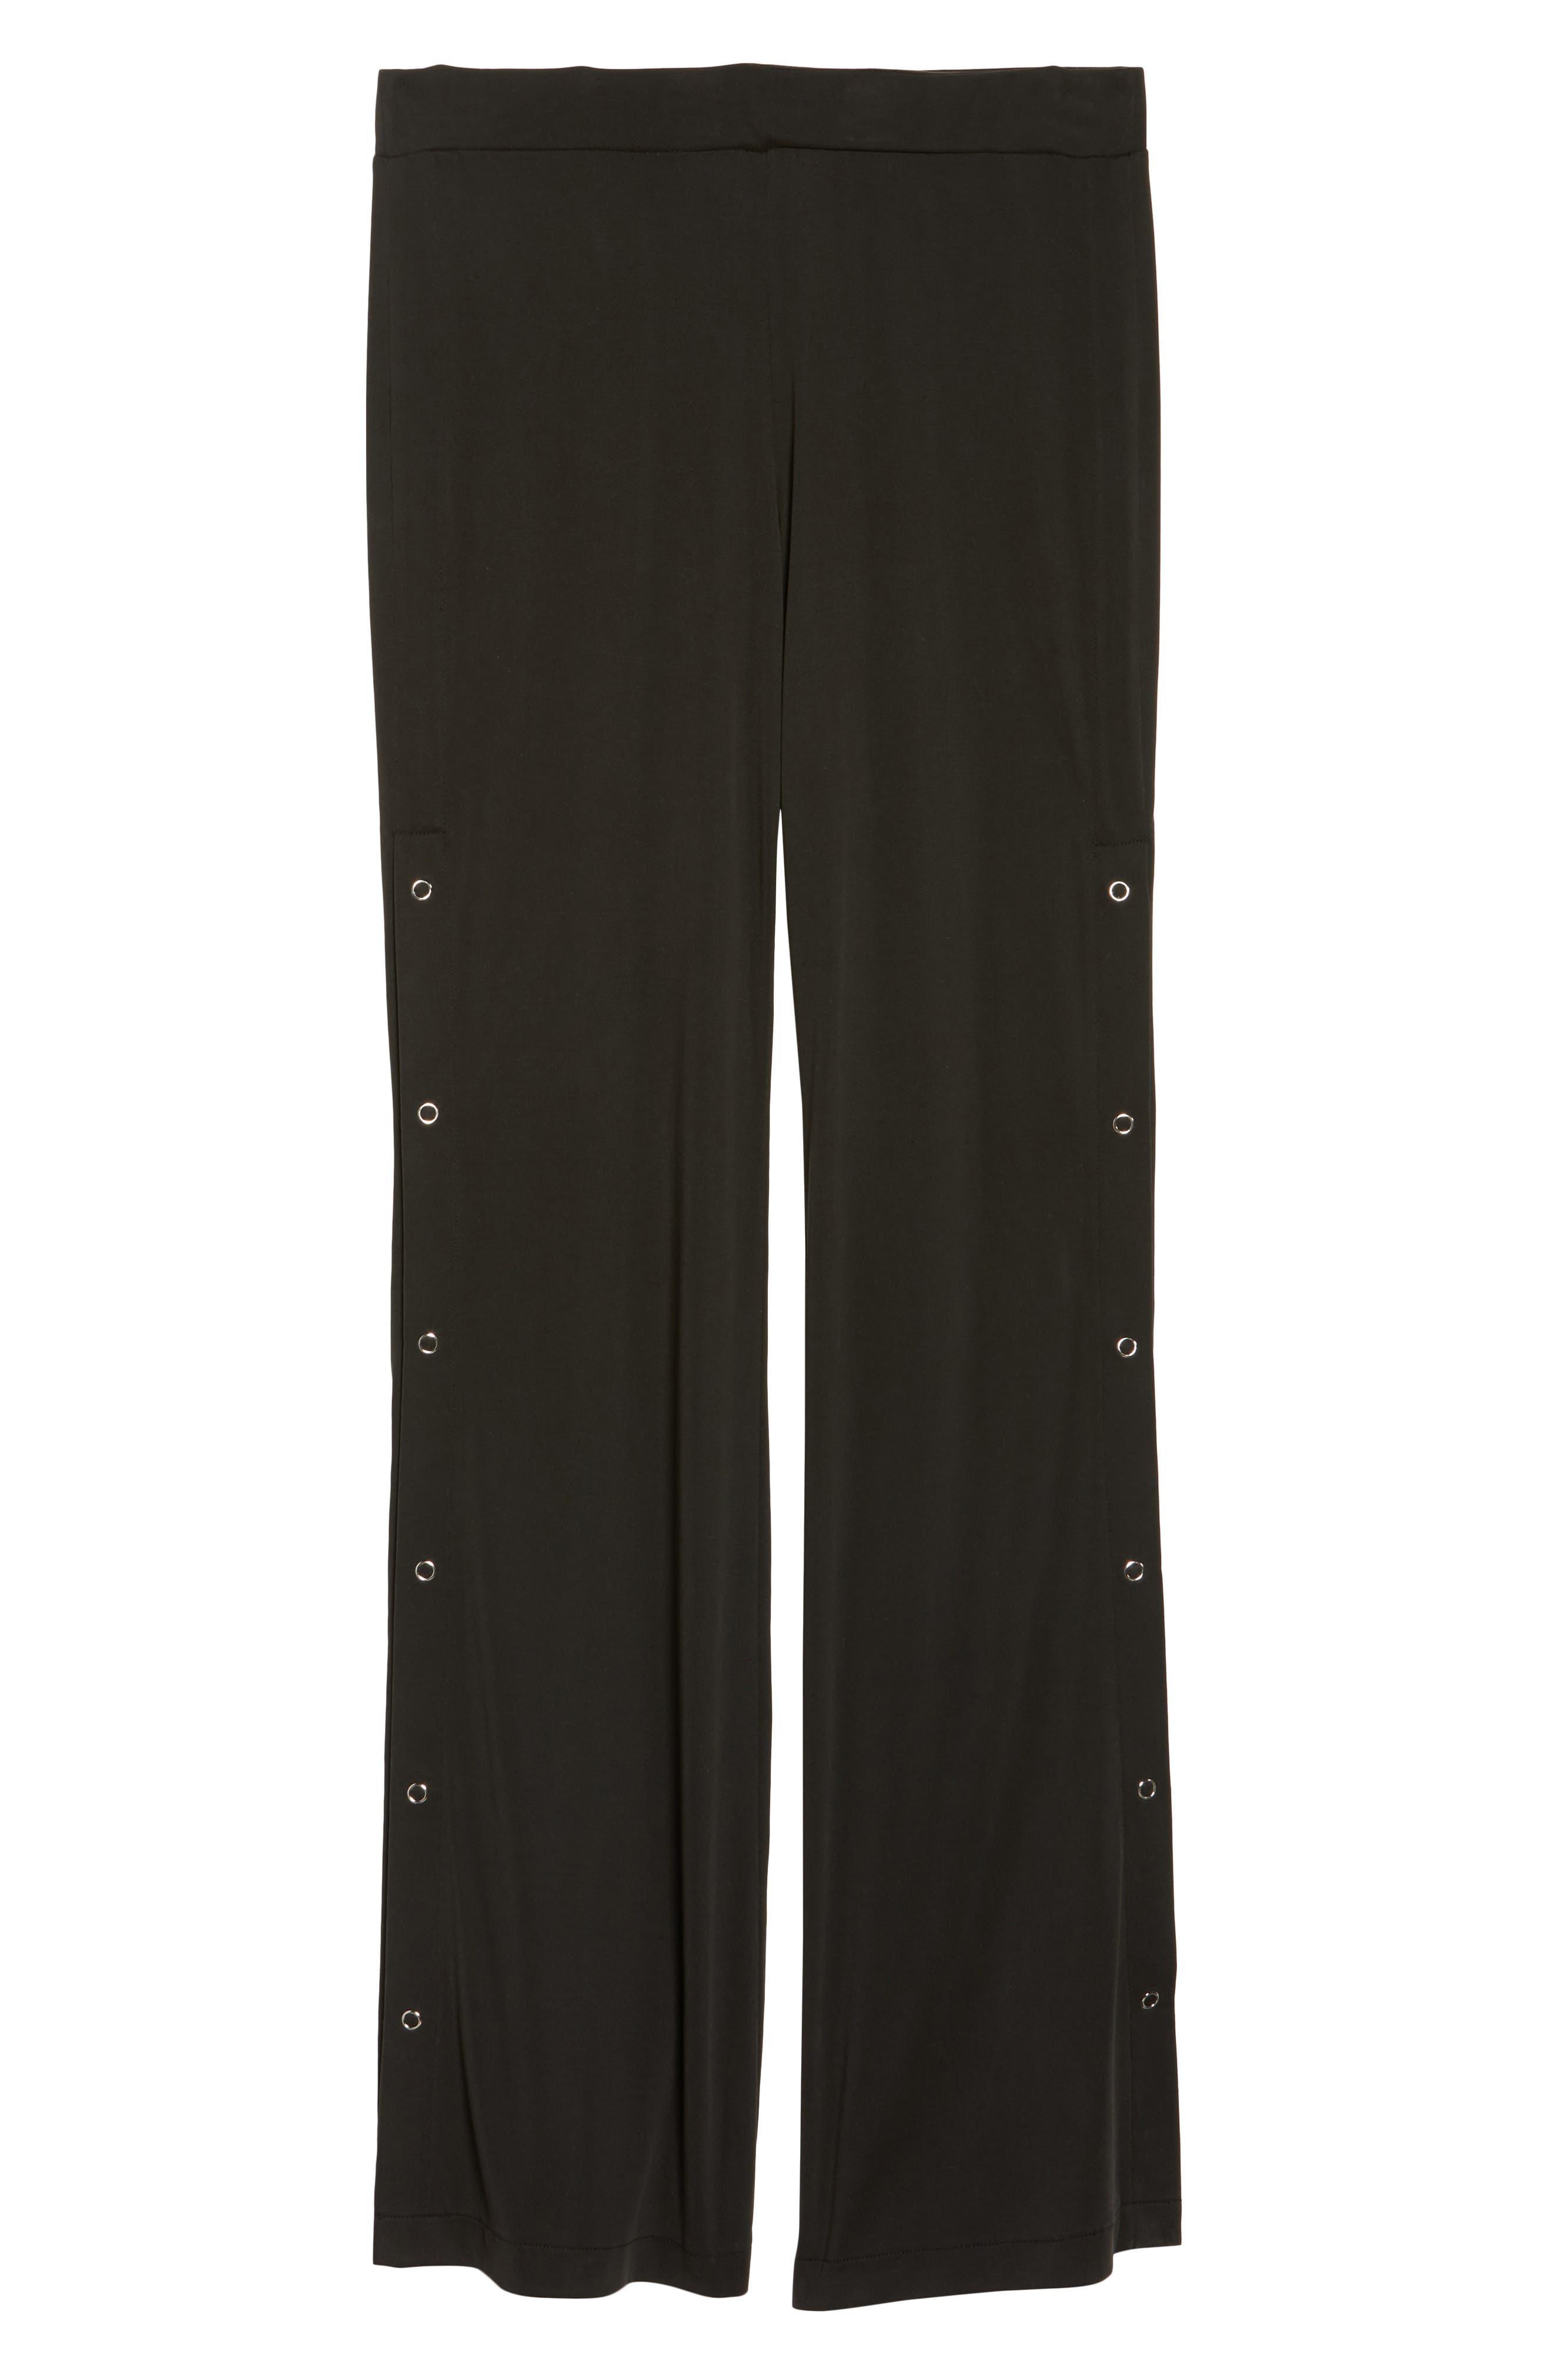 Higgens Side Snap Lounge Pants,                             Alternate thumbnail 4, color,                             Black